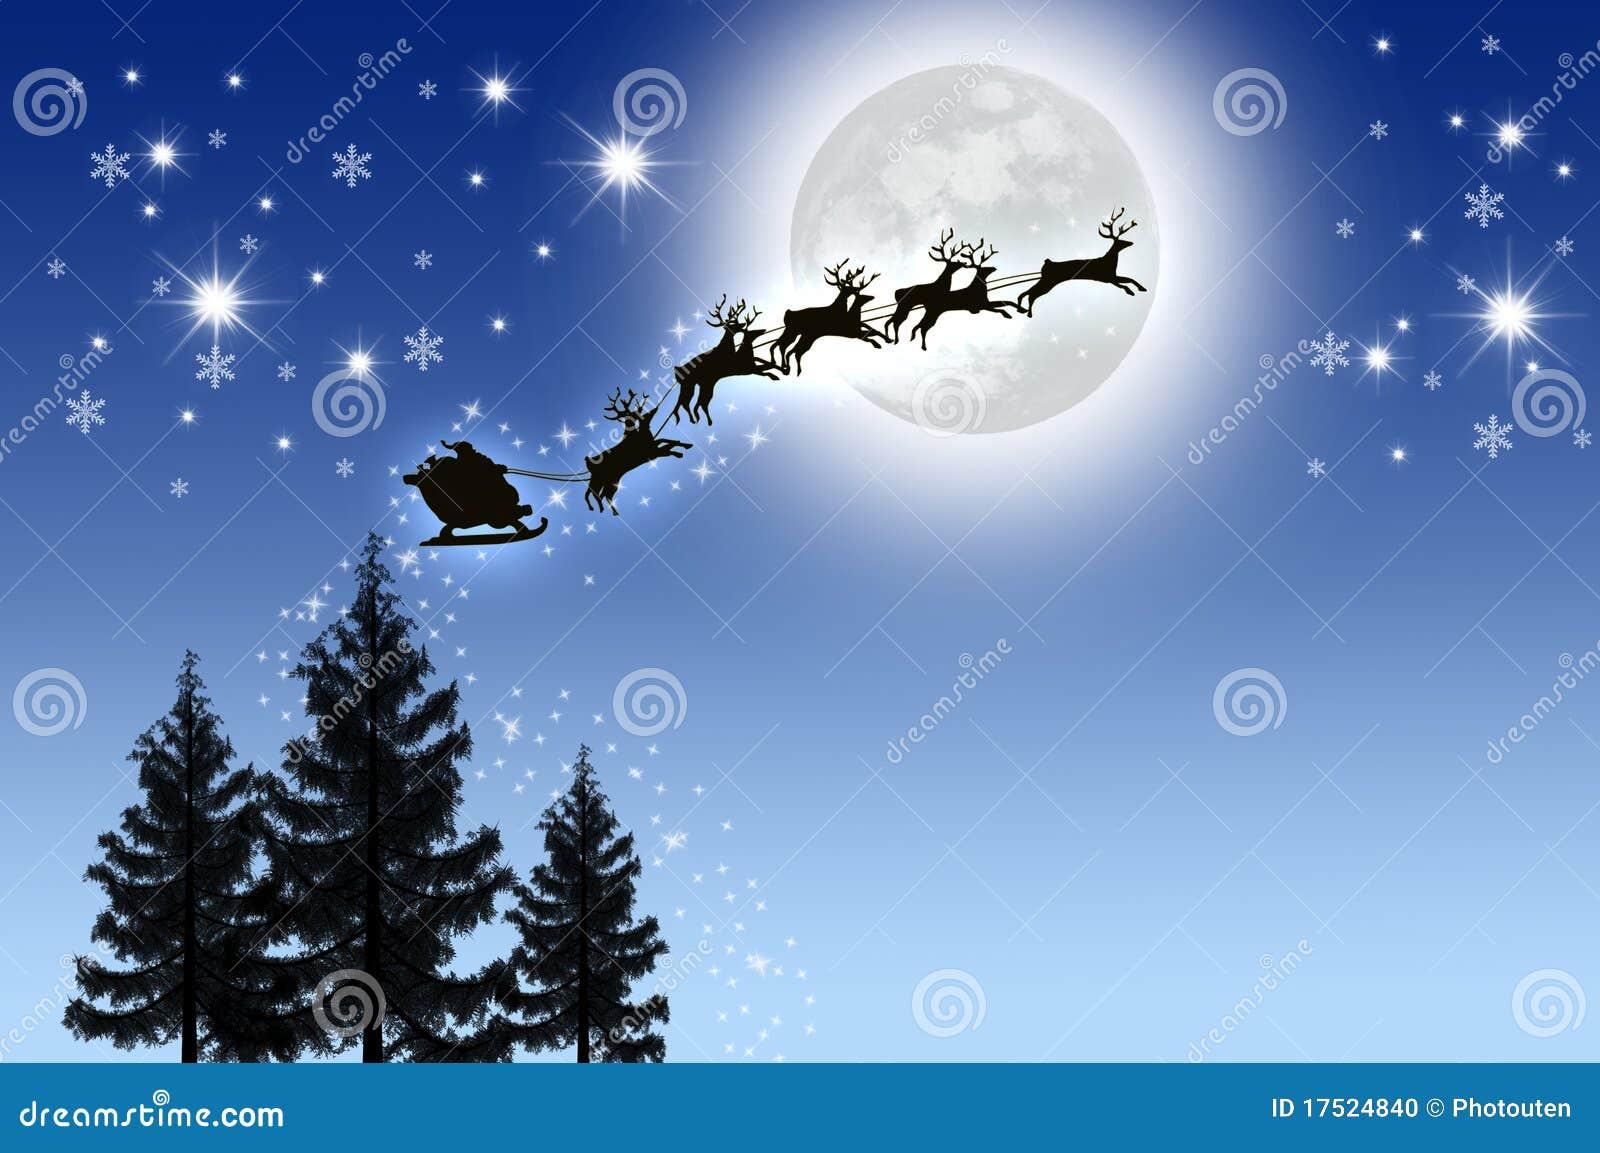 santa sky snow wallpaper - photo #10